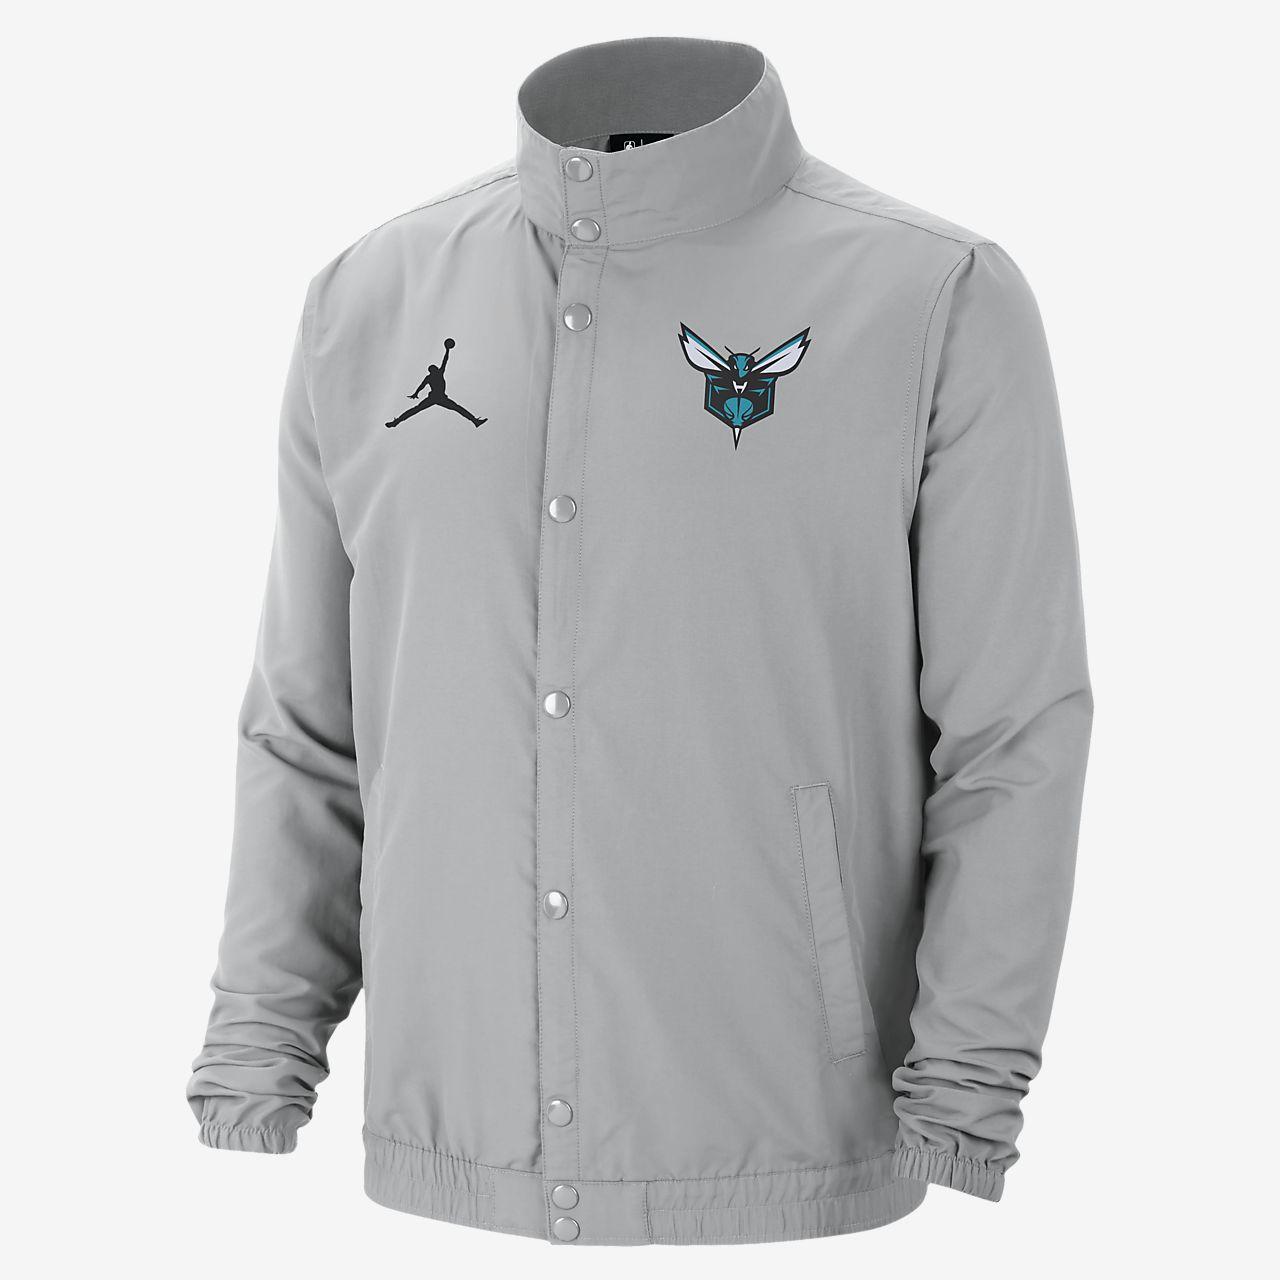 Charlotte Hornets City Edition Men's Jordan NBA Jacket